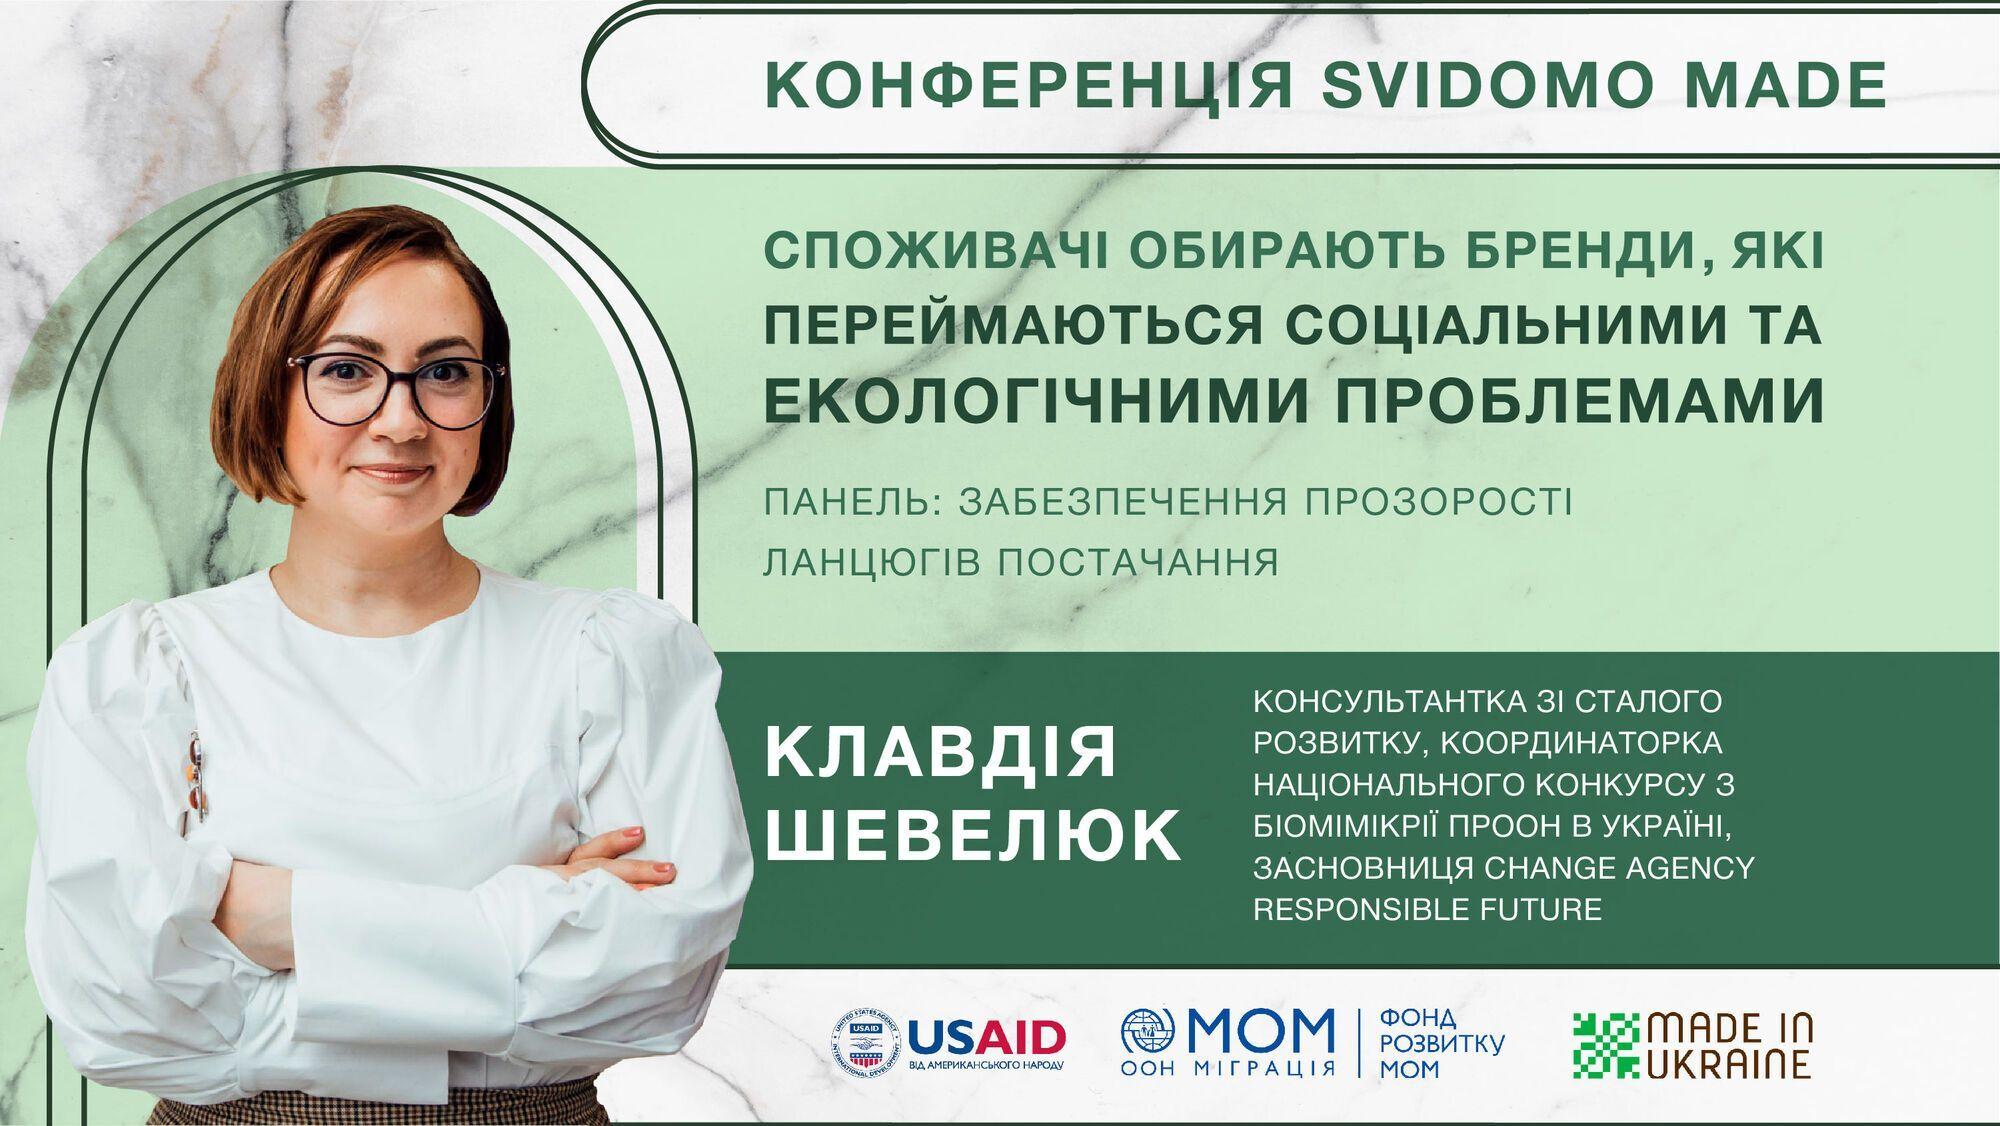 Made in Ukraine провадить великий проєкт Svidomo Made